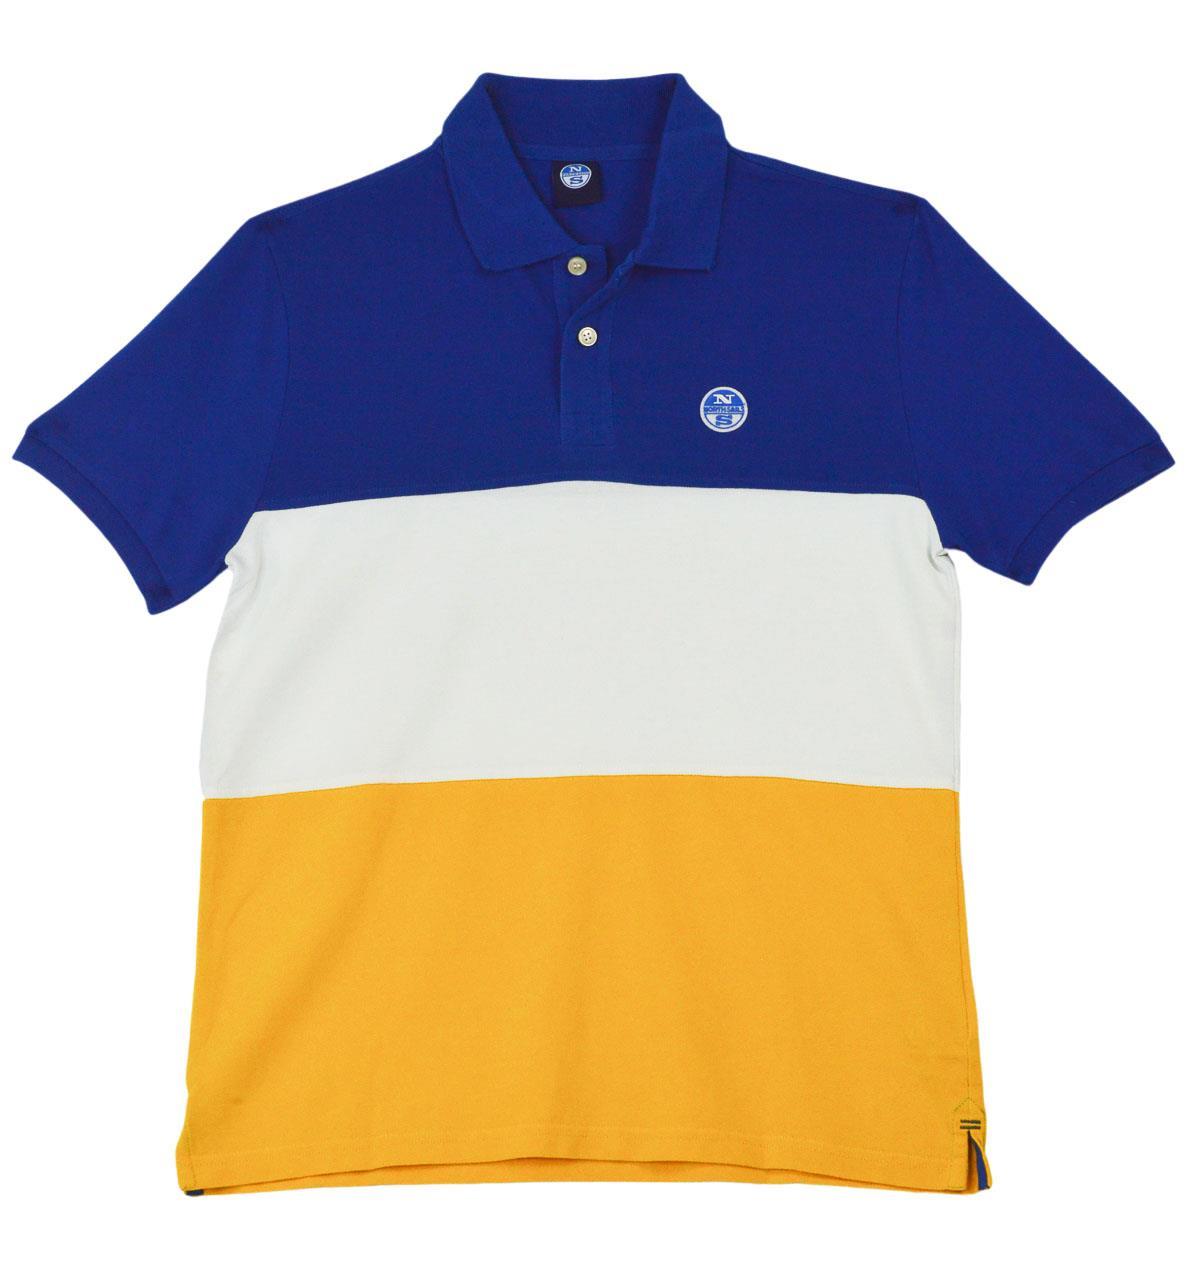 NORTH-SAILS-Mens-Legacy-Heritage-Short-Sleeve-Polo-Shirt-SALE-RRP-50 thumbnail 13